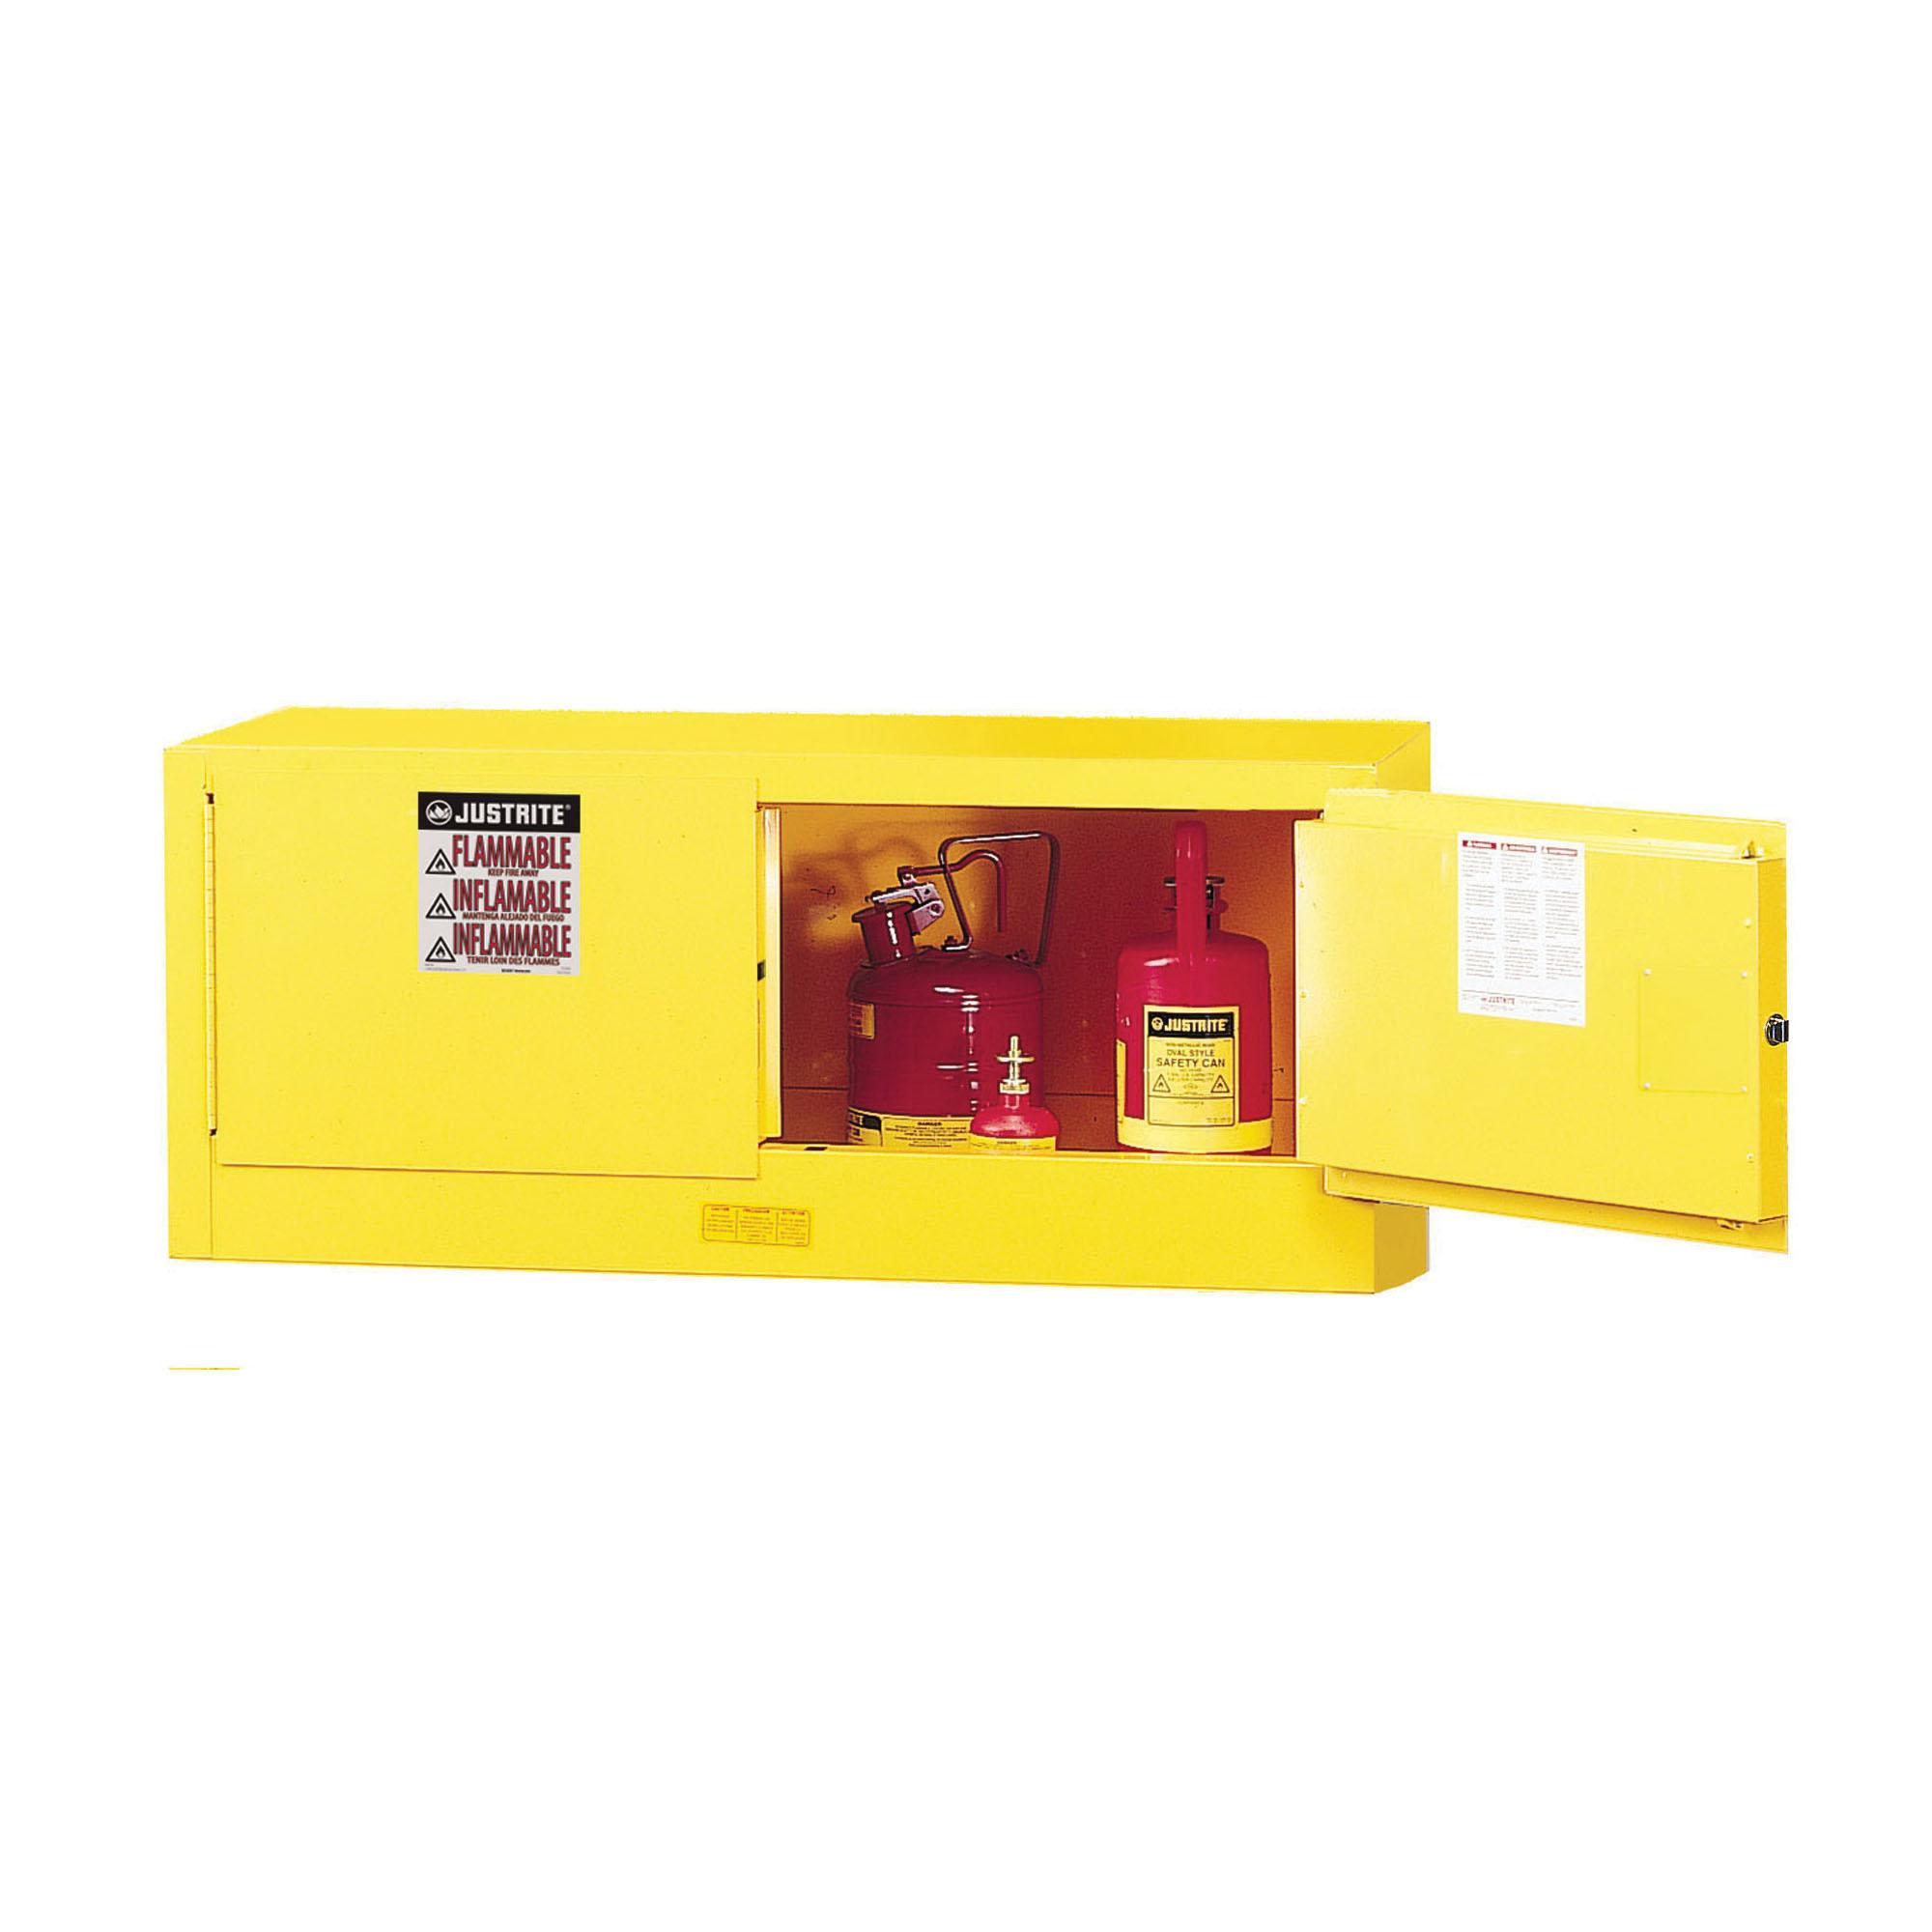 Justrite® 891300 Sure-Grip® EX Piggyback Flammable Safety Cabinet, 12 gal Capacity, U-Loc™ Handle, 18 in H x 43 in W x 18 in D, Manual Close Door, 2 Doors, 1 Shelves, Cold Rolled Steel, Yellow